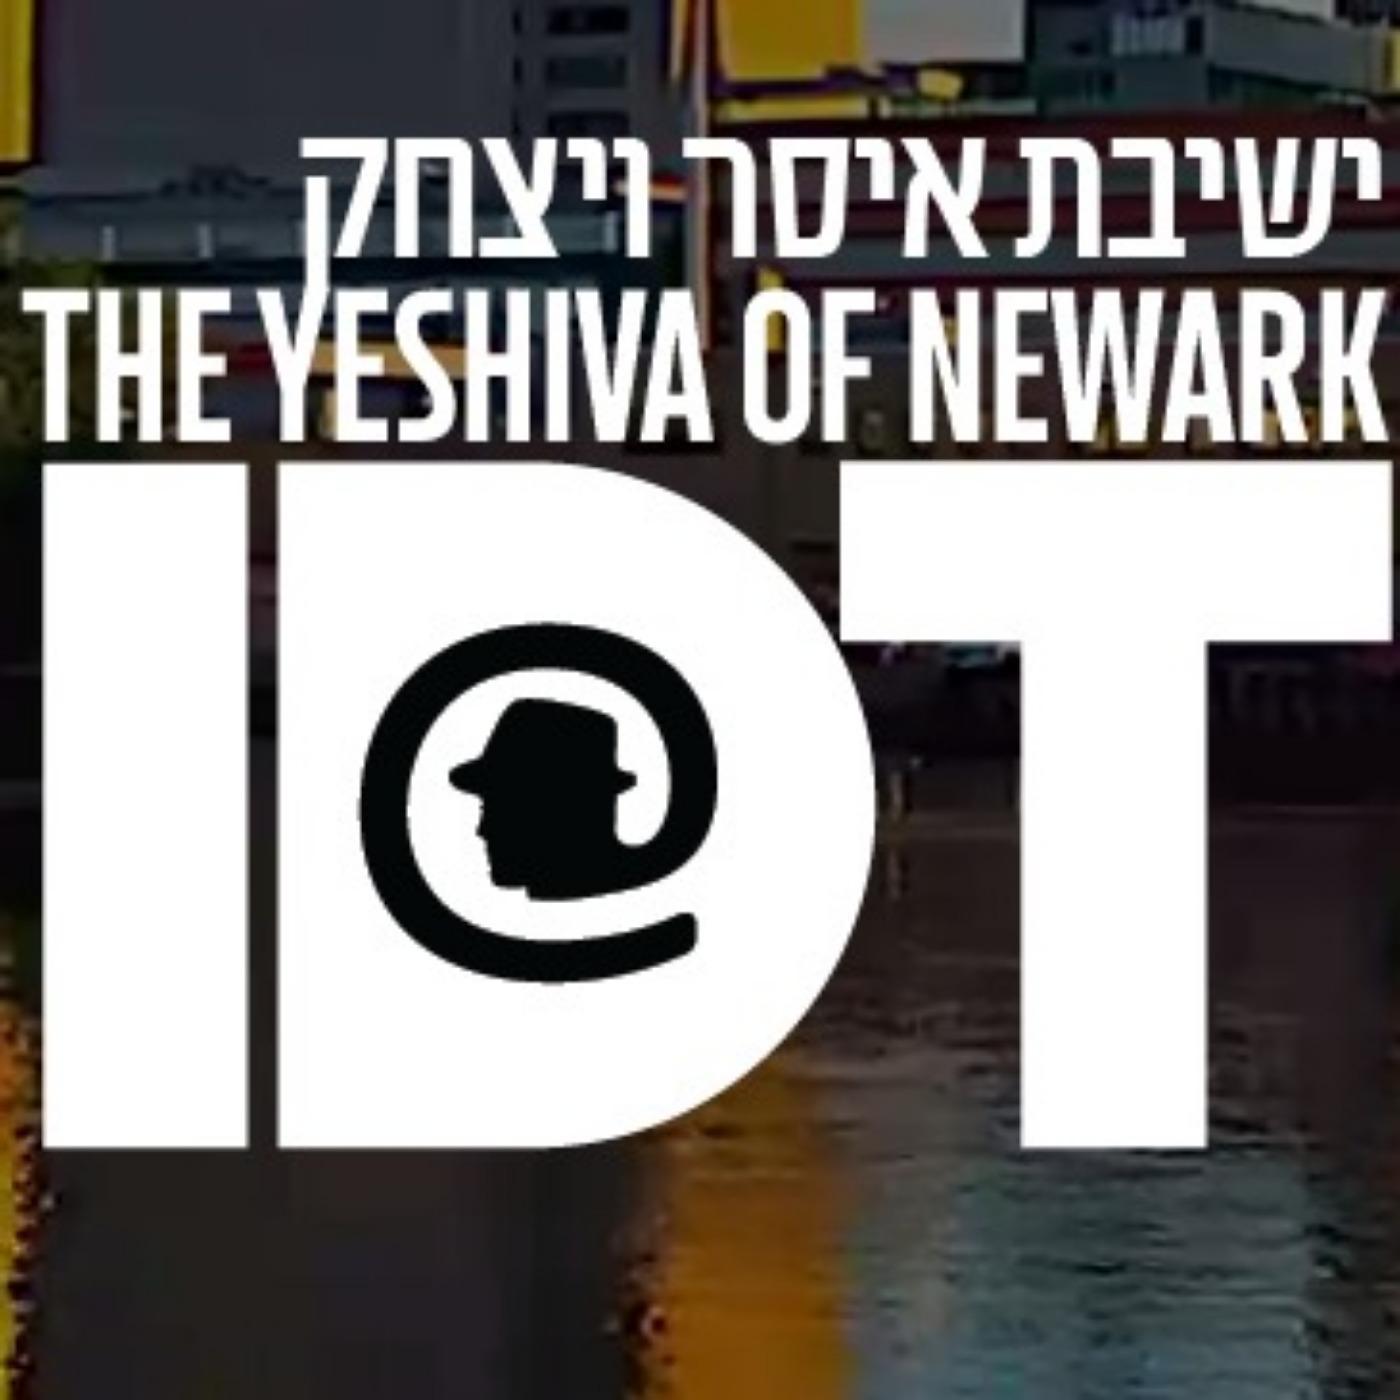 Yeshiva of Newark Podcast